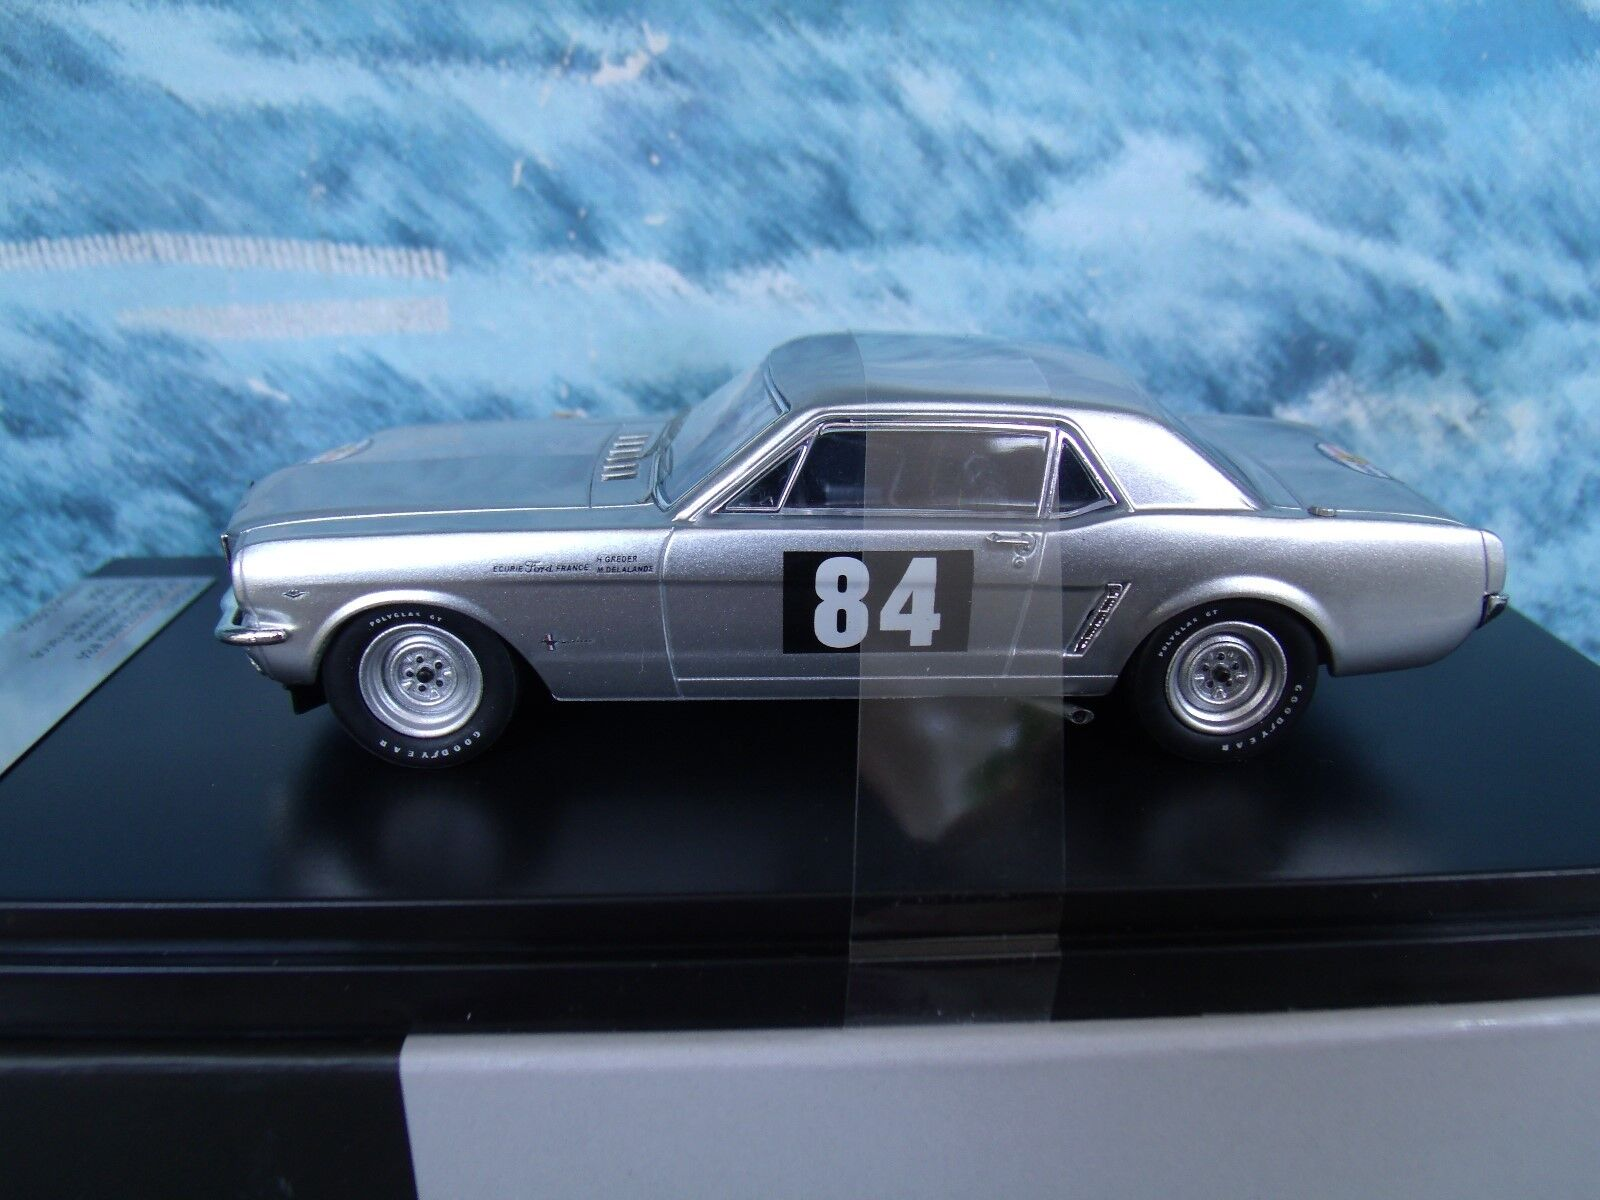 1 43 Premium X Ford Mustang Tour De France 1964 Grossoer-Delalande